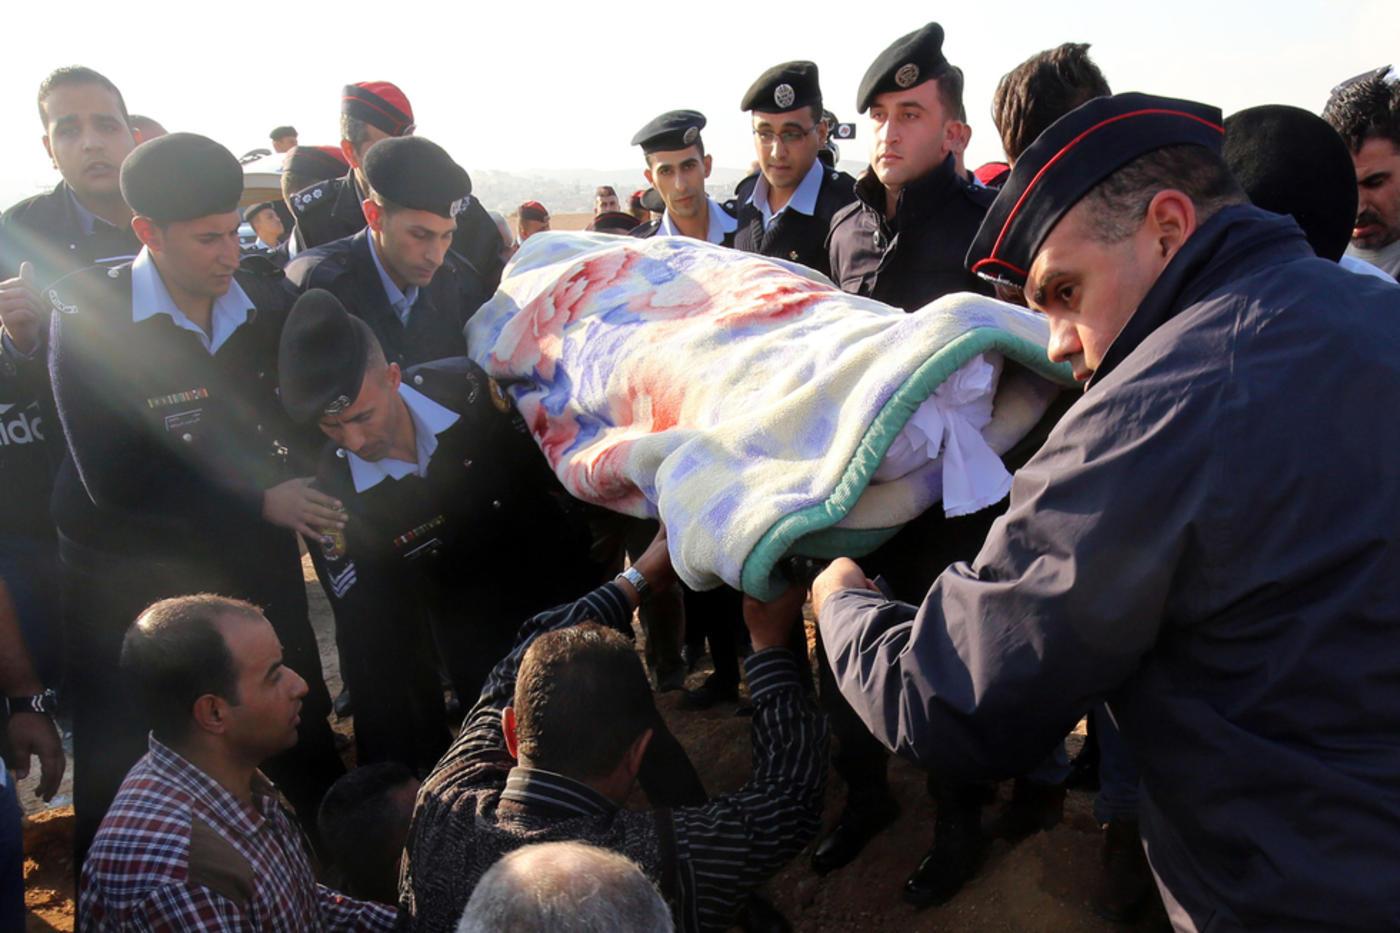 Jordanian spies sold Syrian rebel weaponry on black market: Report